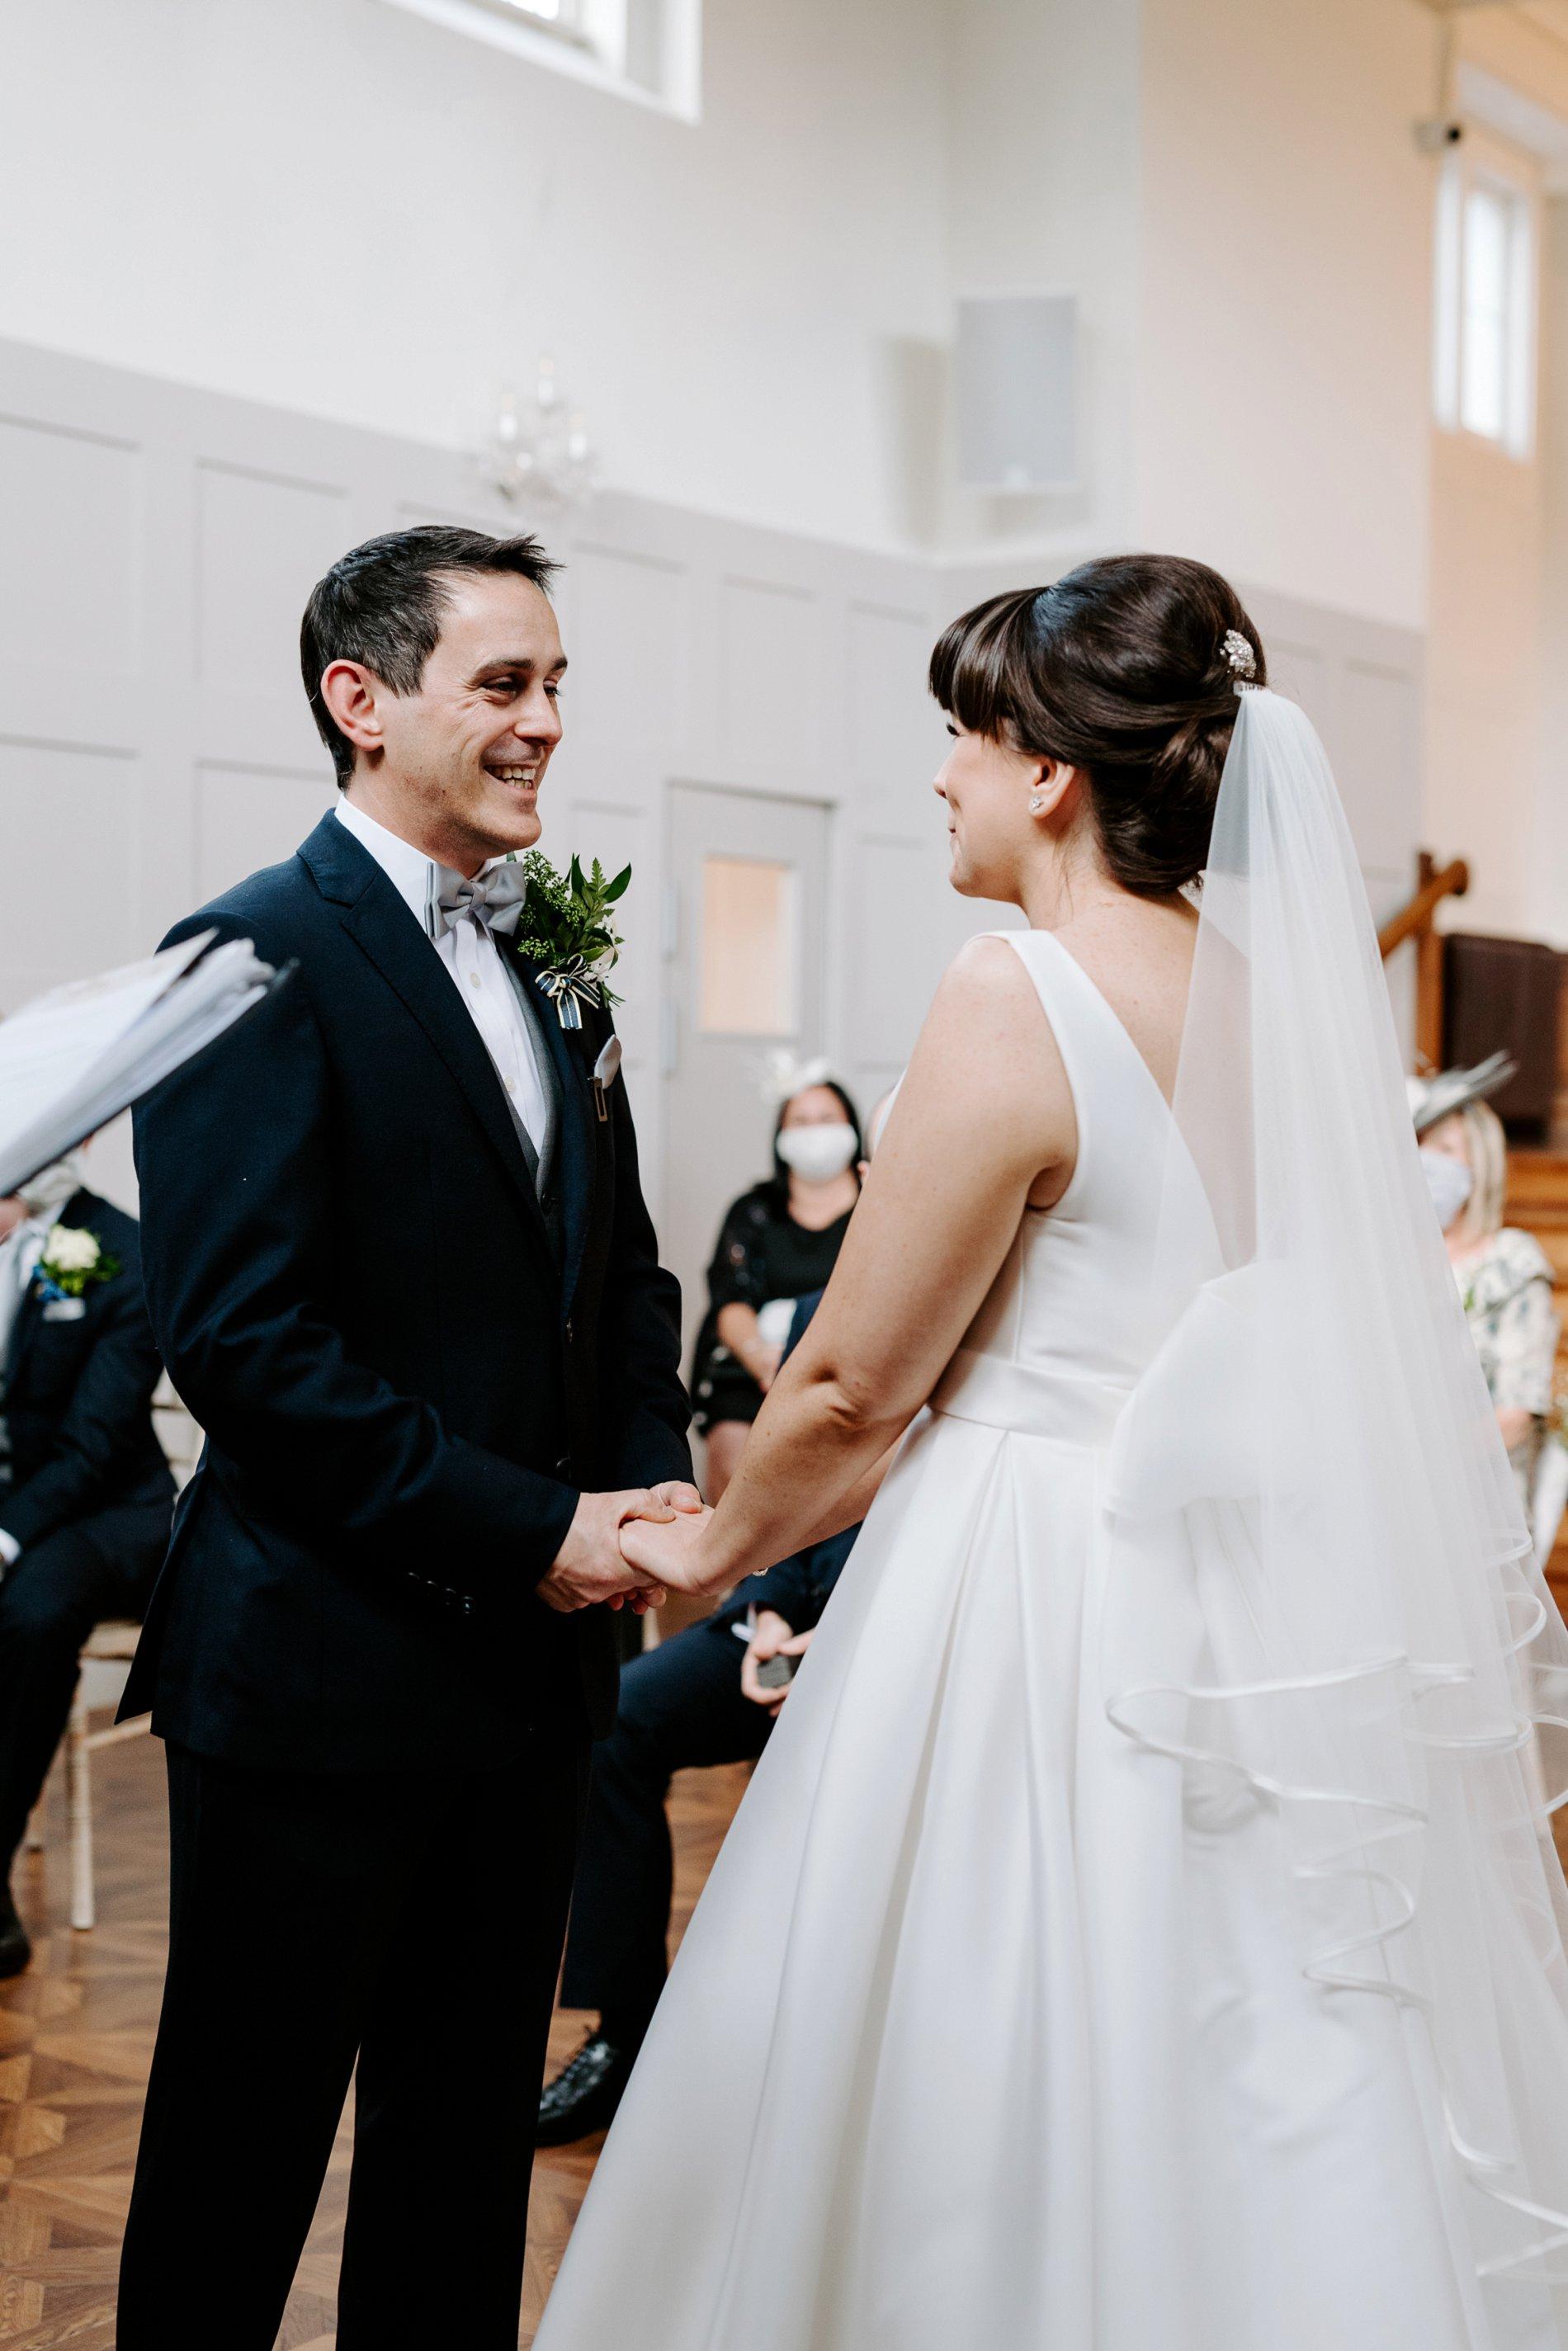 An Elegant White Wedding at Thicket Priory (c) Carla Whittingham Photography (37)